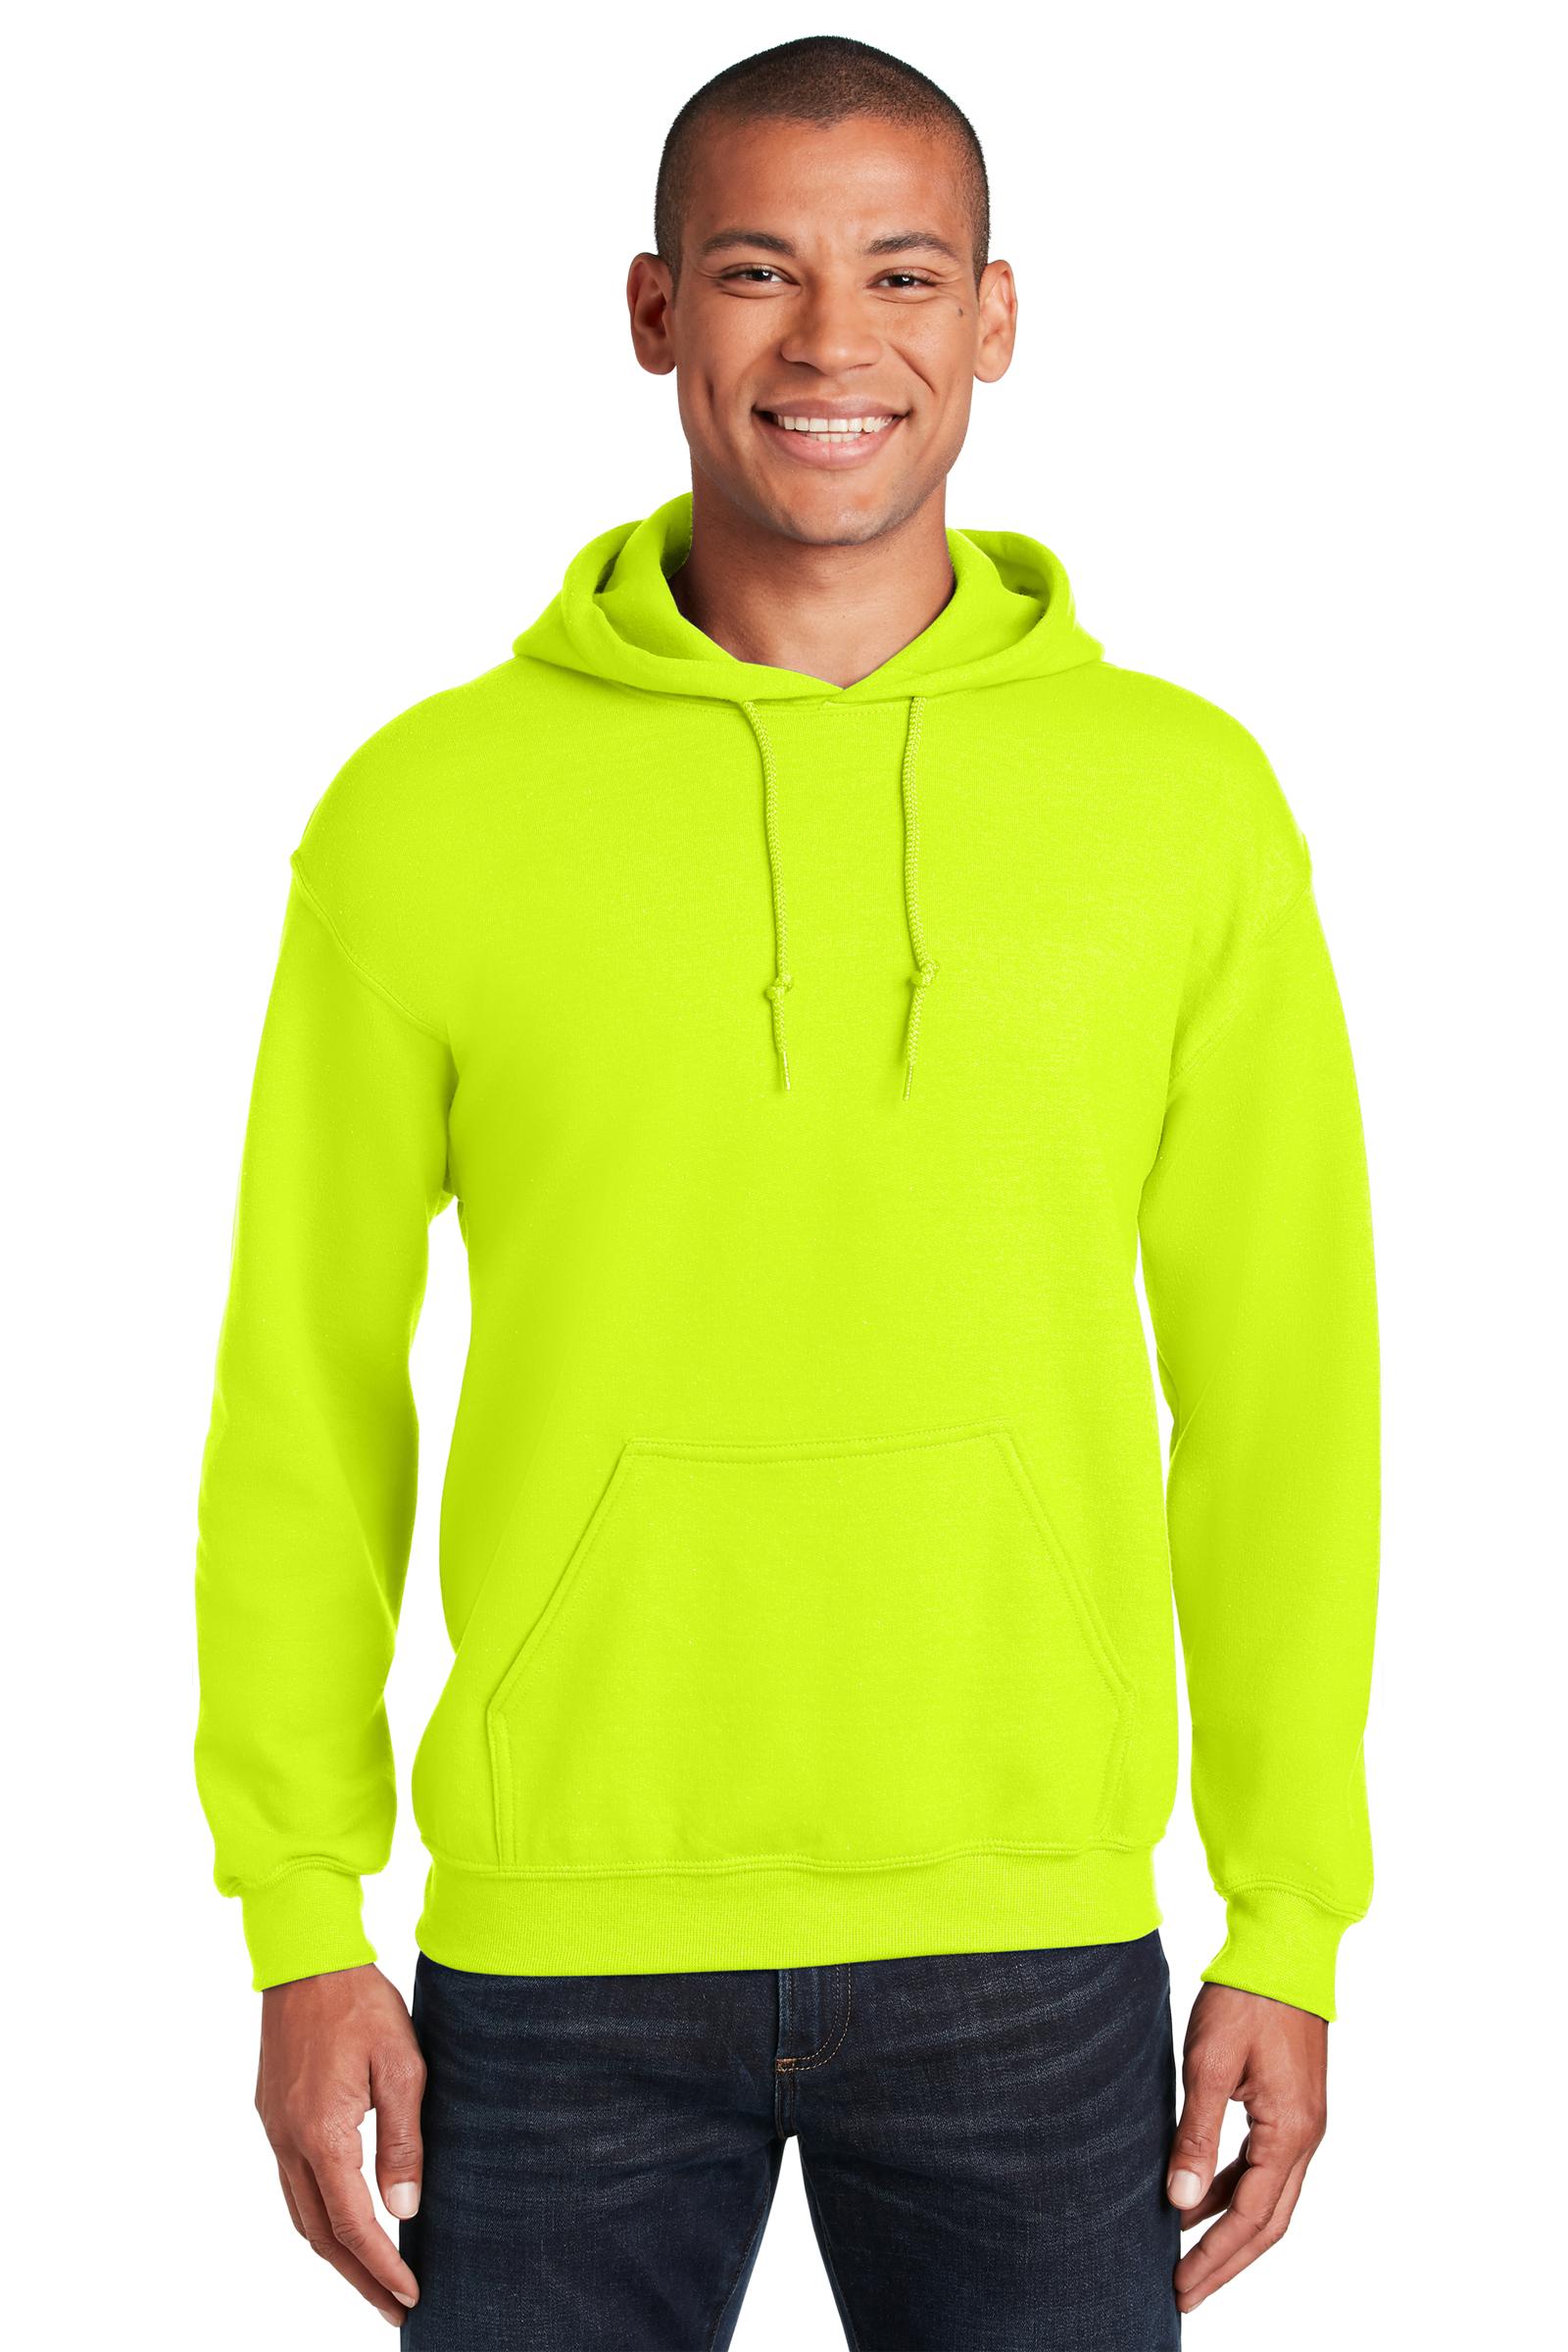 Gildan Printed Men's Heavy Blend Pullover Hooded Safety Sweatshirt